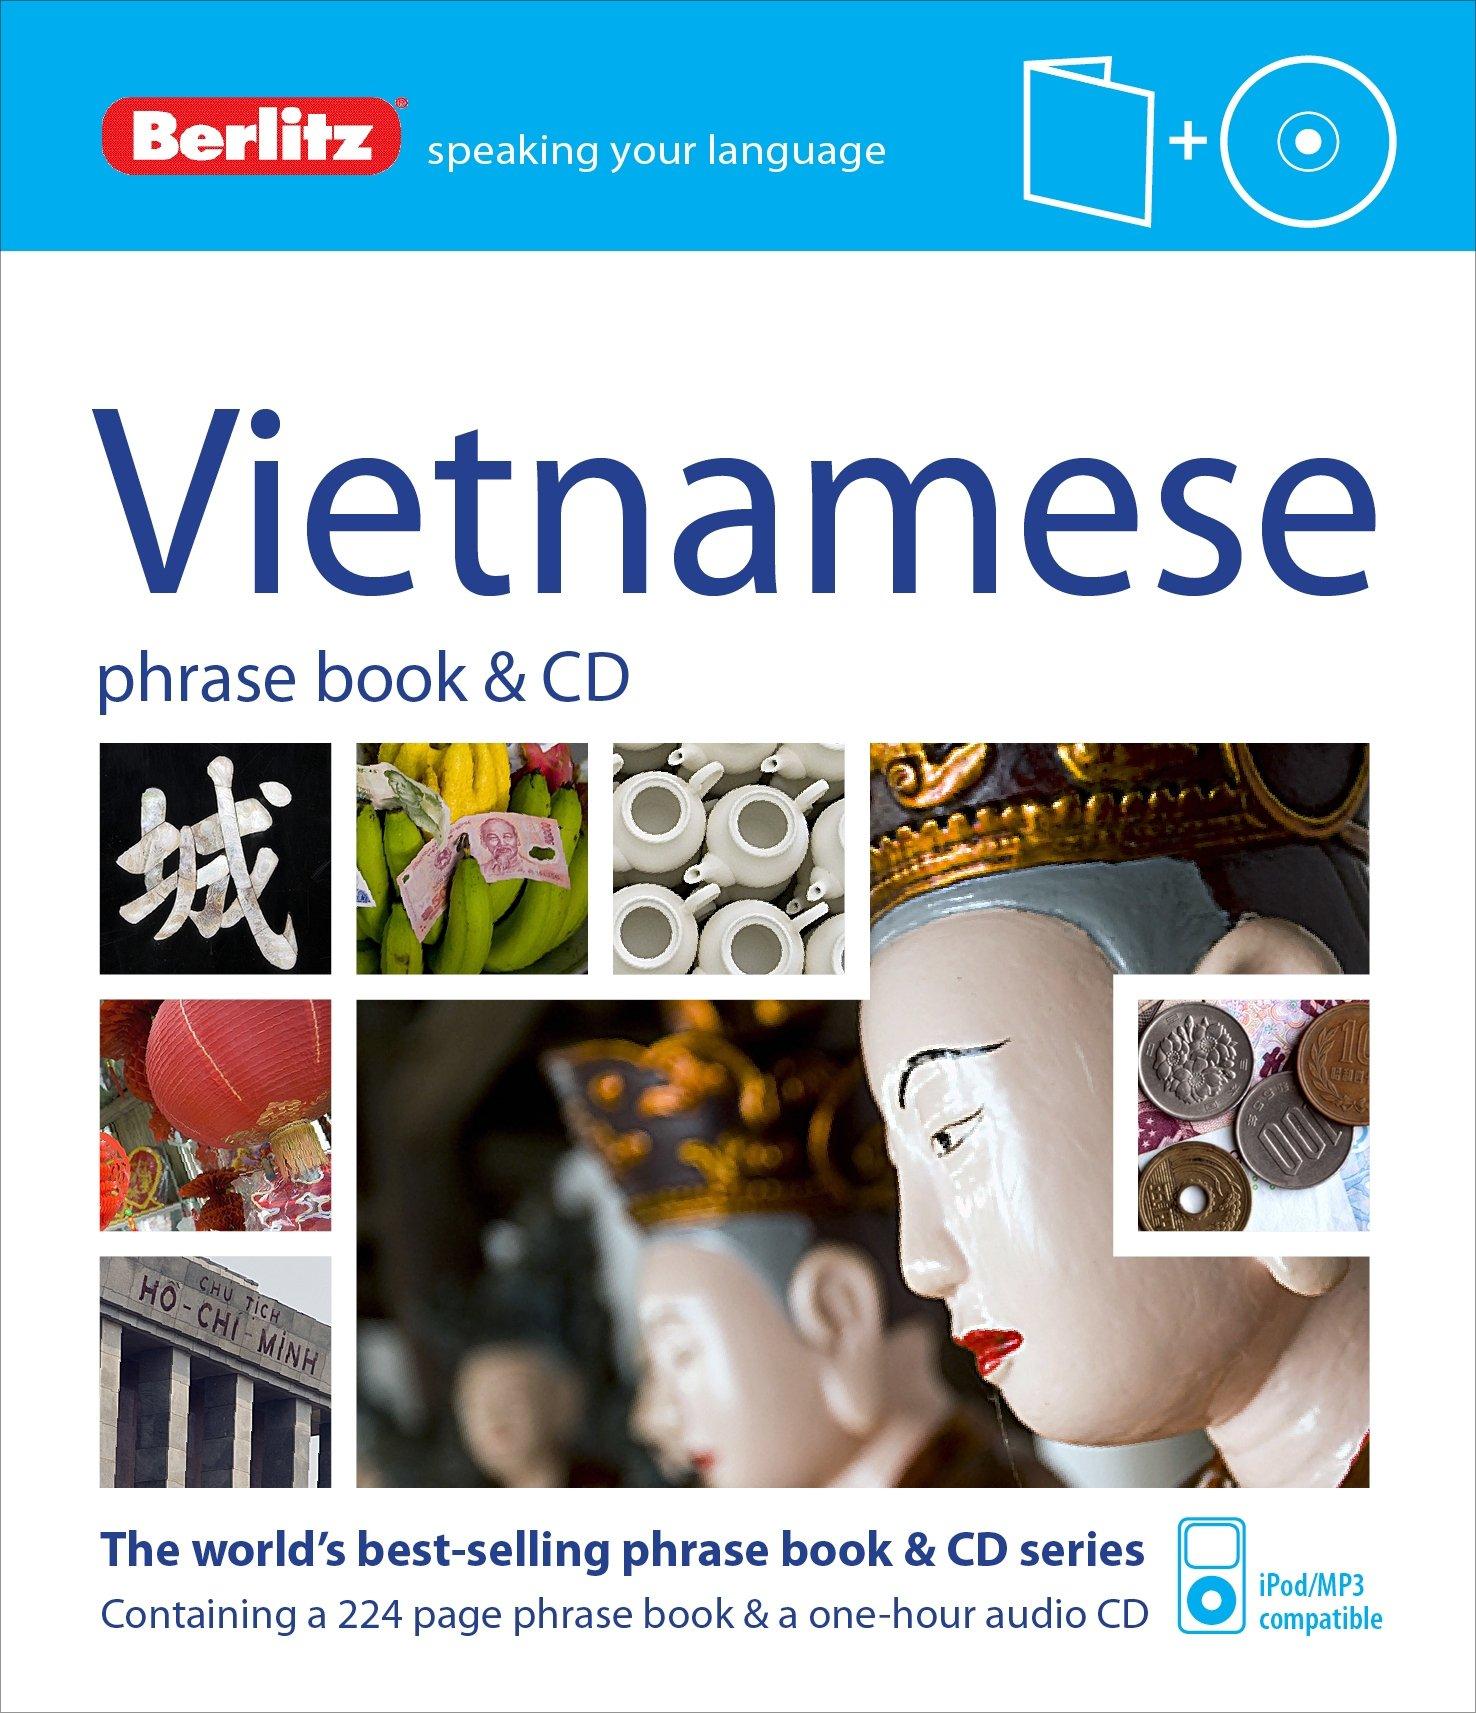 Berlitz Language  Vietnamese Phrase Book And CD  Berlitz Phrase Book And CD